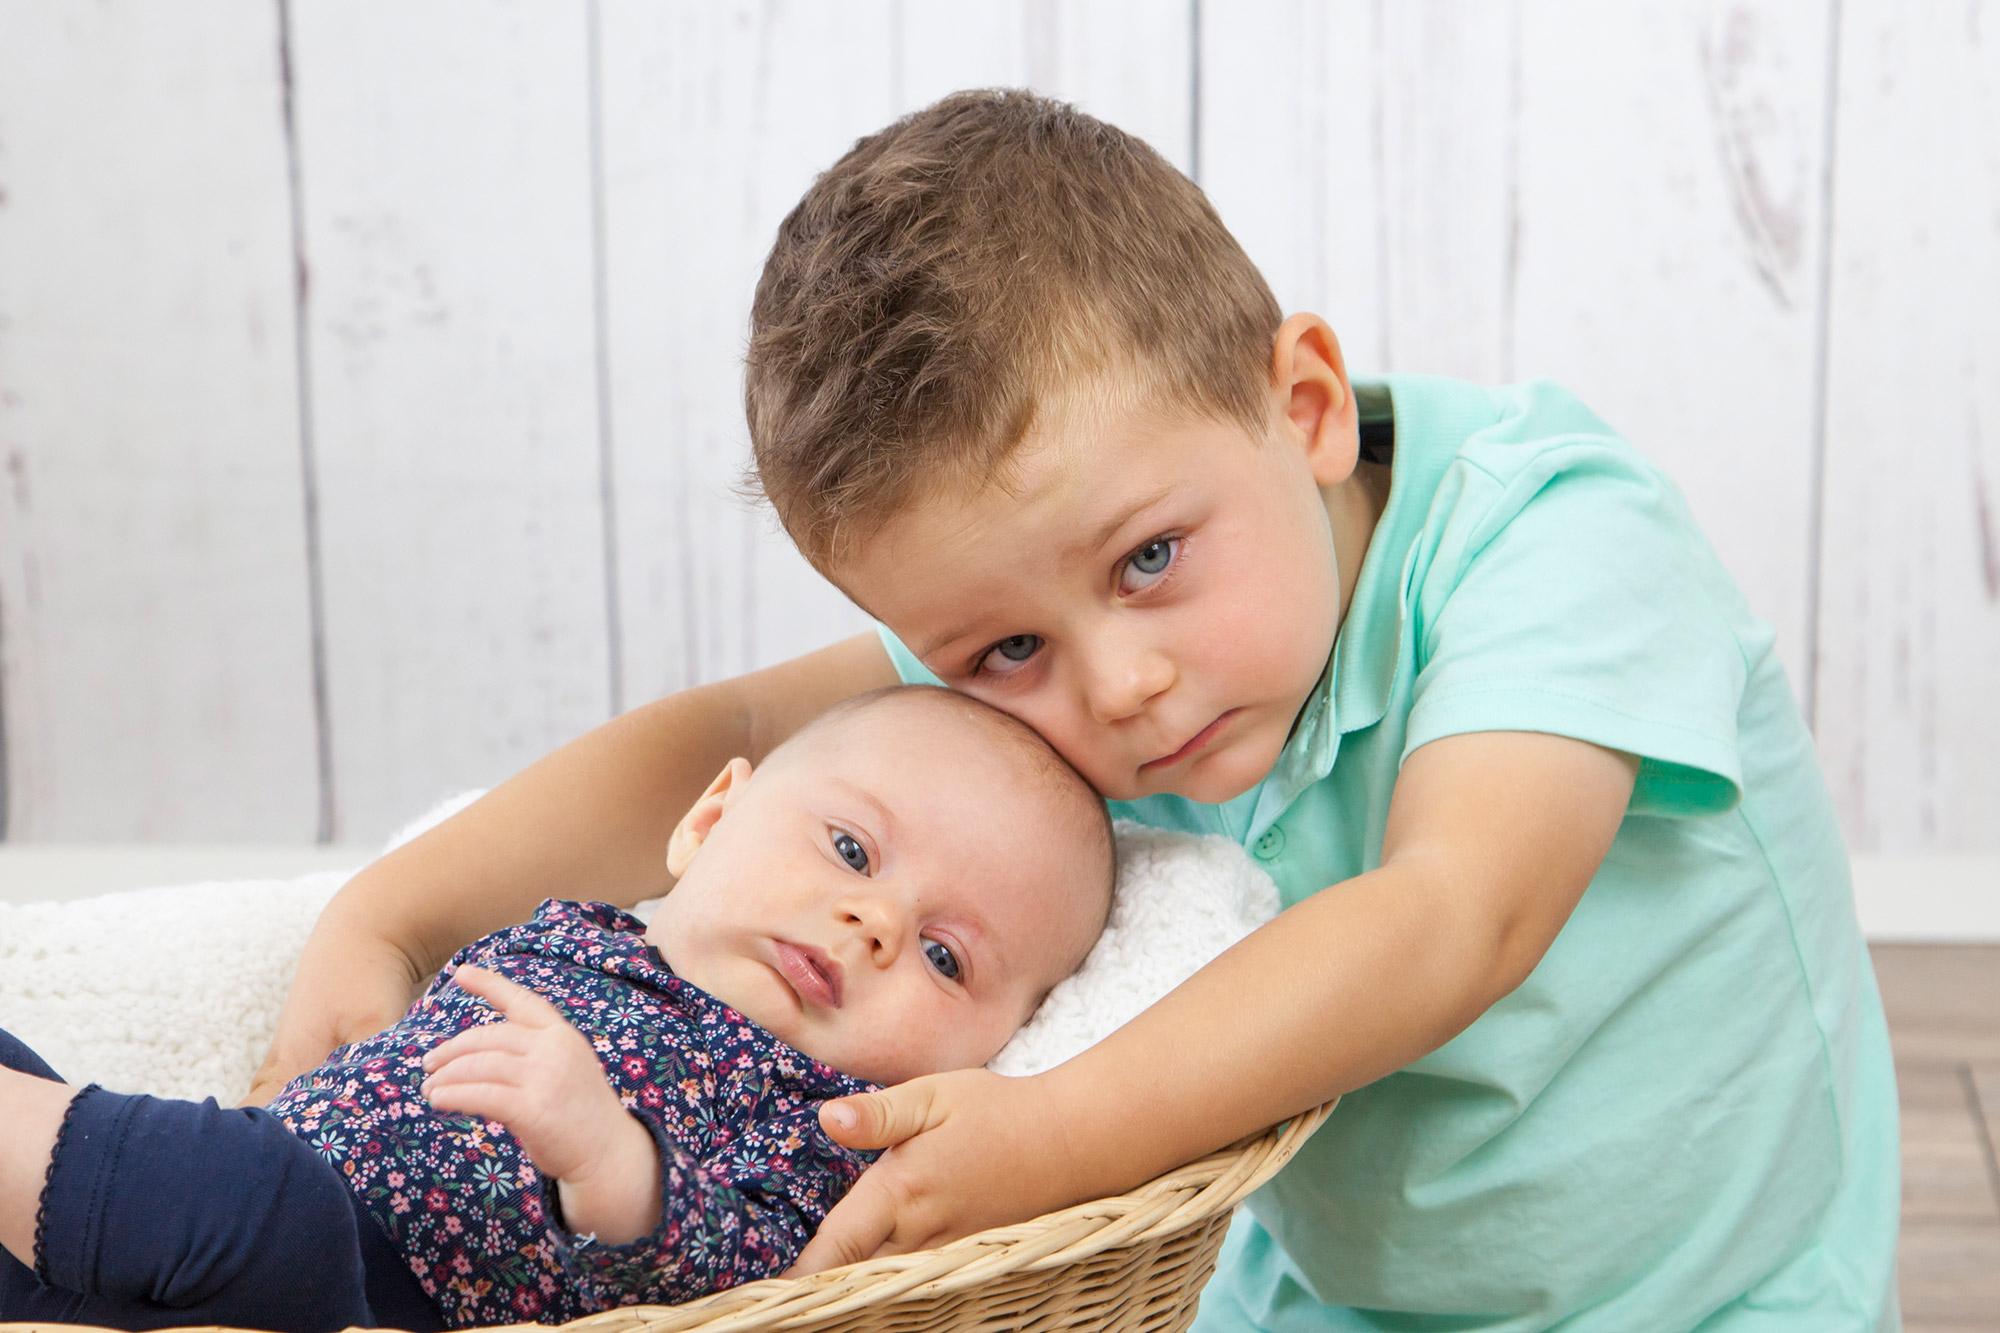 Familienshooting, Familienbilder, Familie, Babybauch